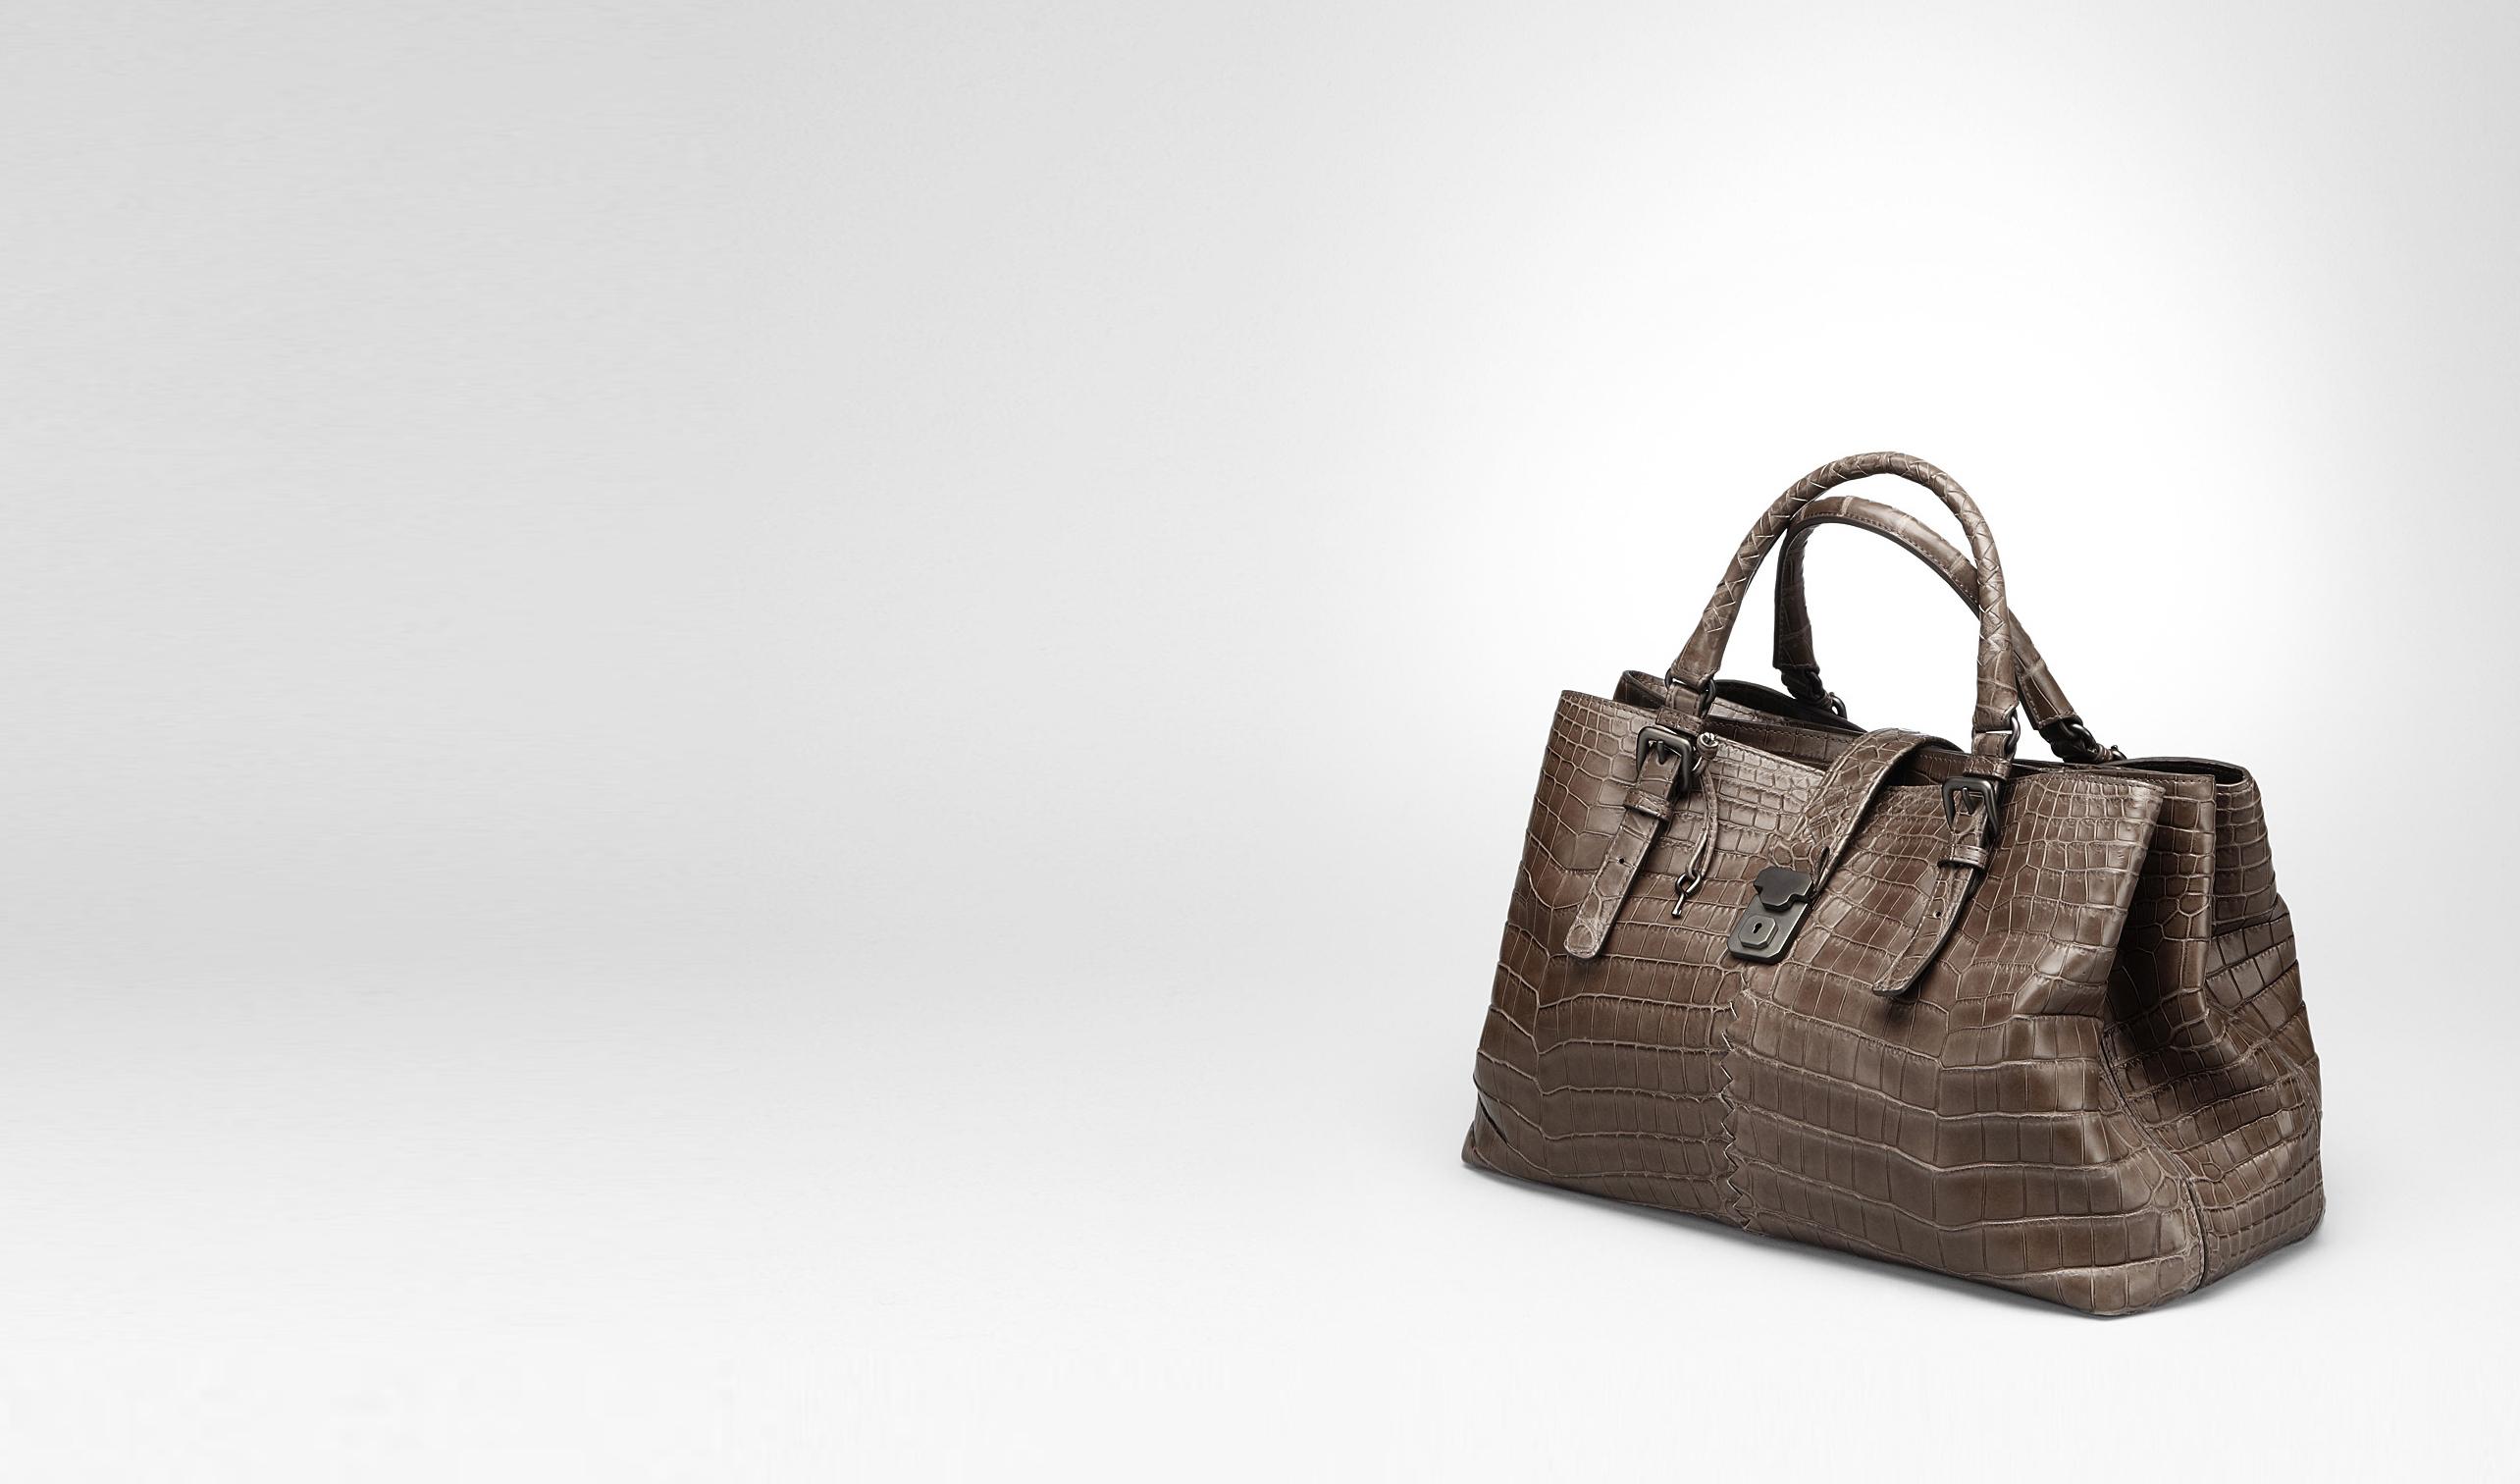 BOTTEGA VENETA Top Handle Bag D MEDIUM ROMA BAG IN EDOARDO CROCODILE pl